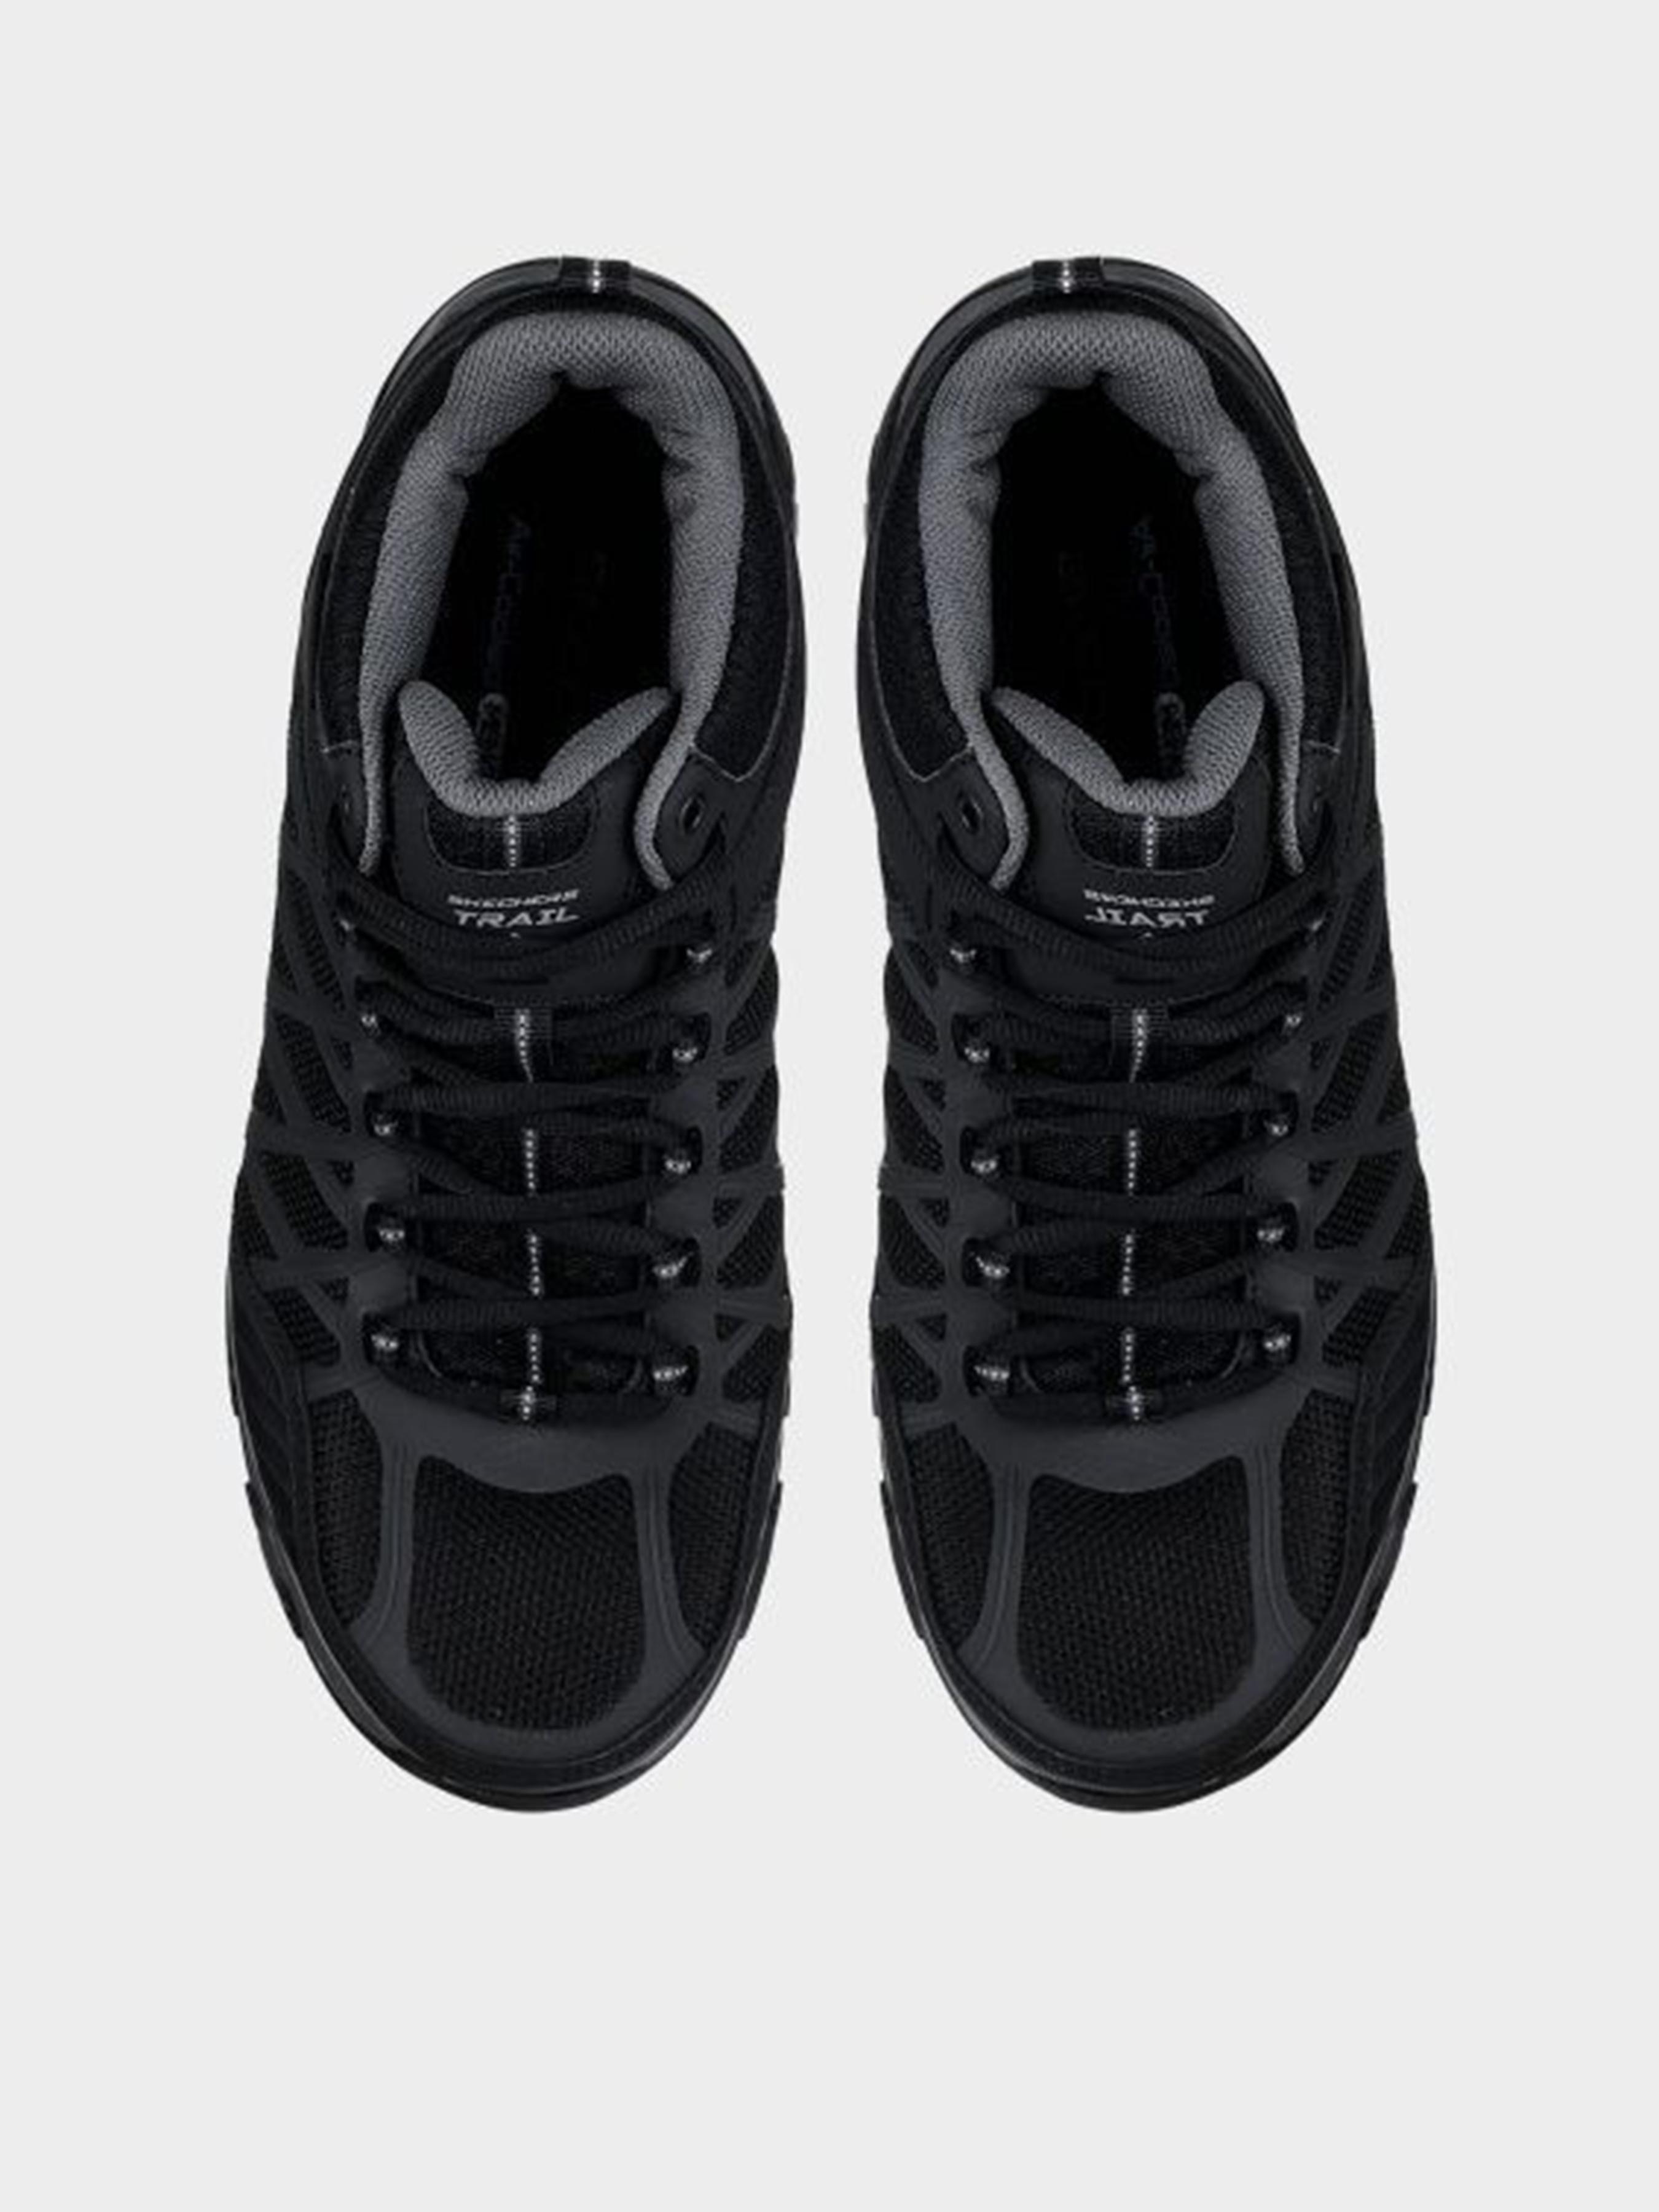 Ботинки для мужчин Skechers KM3047 стоимость, 2017